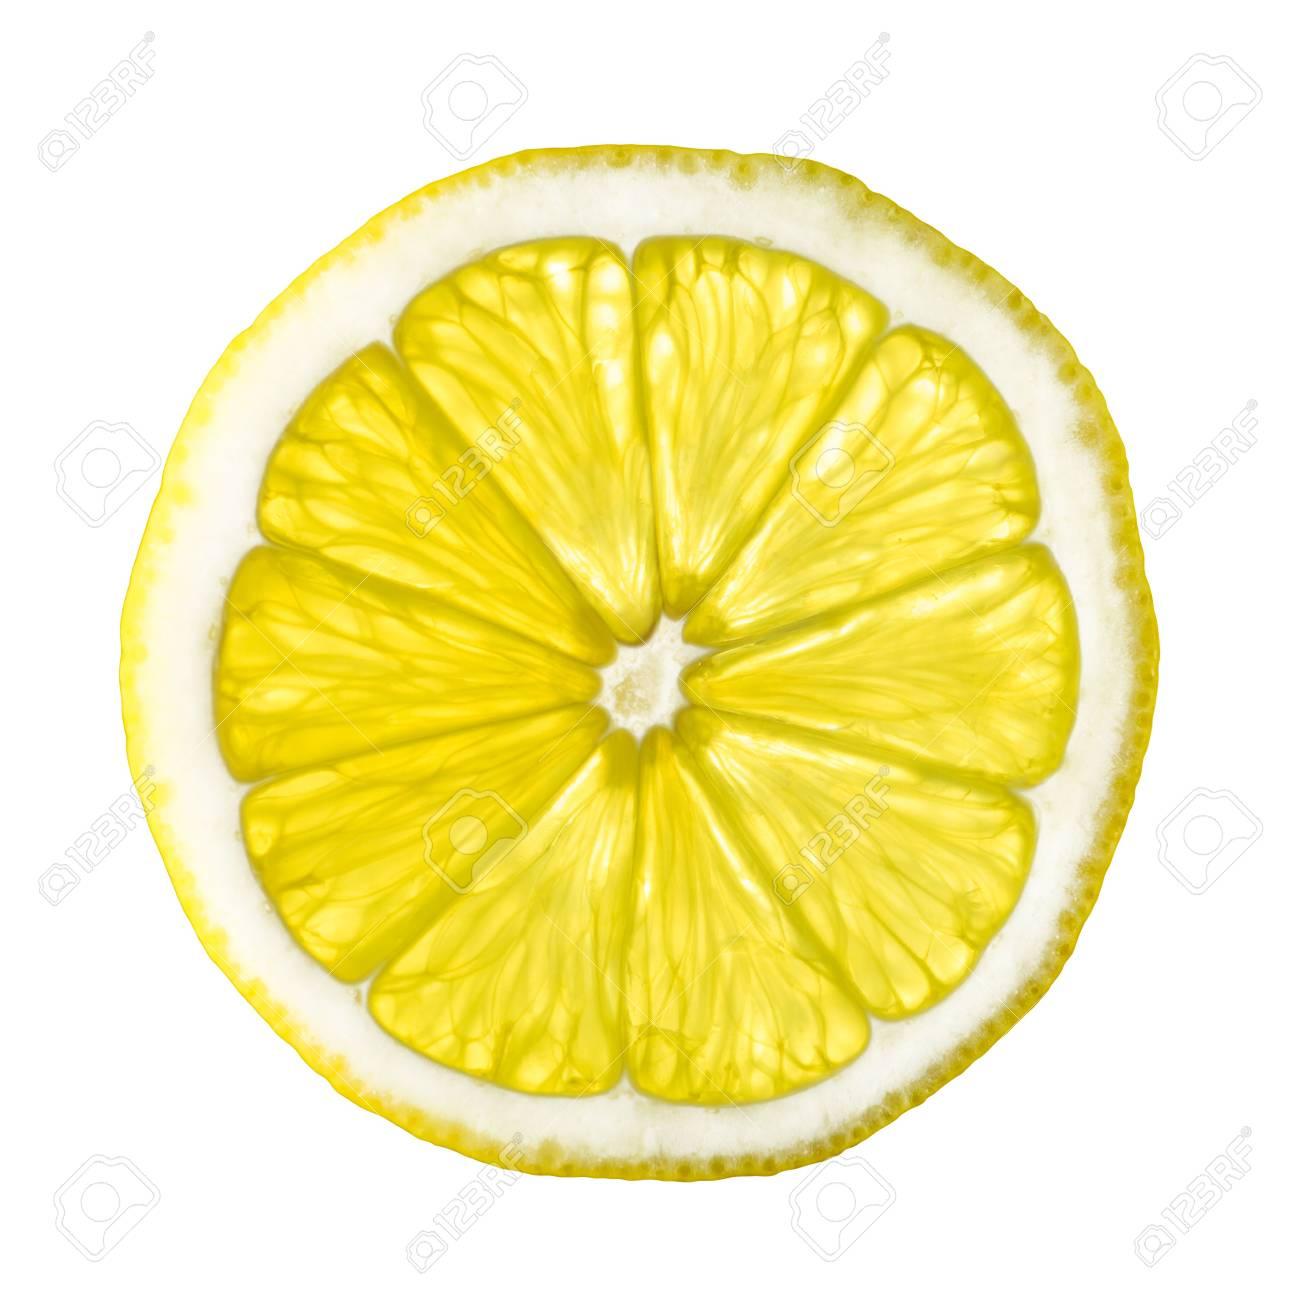 isolated lemon slice on white background close up picture